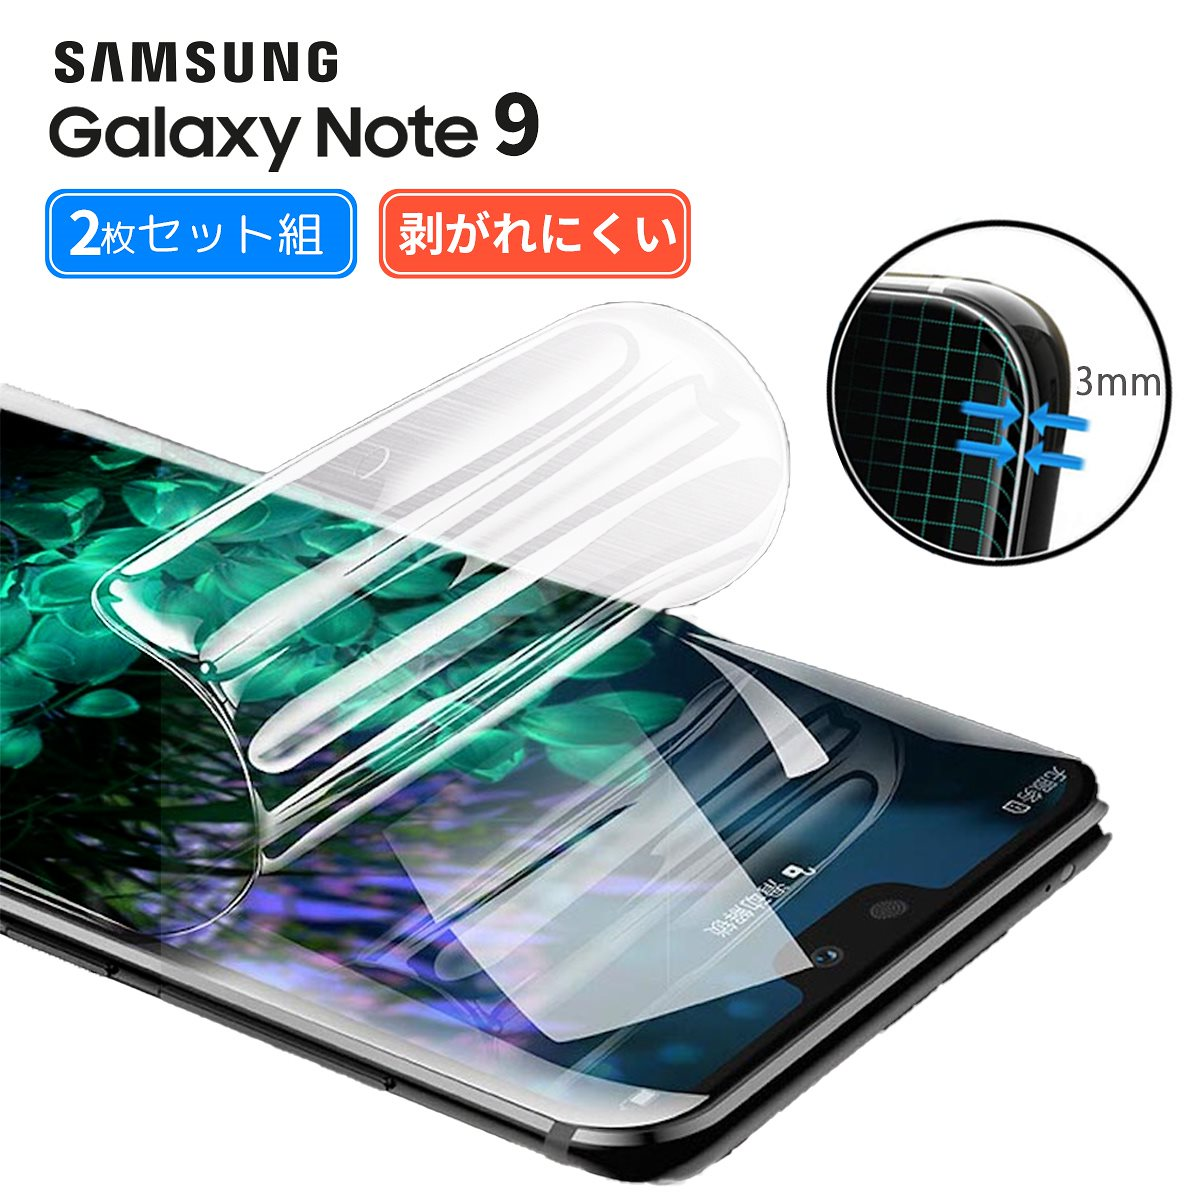 Galaxy Note 9 スマホ 全面 フィルム docomo SC-01L au SCV40 ギャラクシー ノート9 対応 カバー 手帳型 ケース に 干渉しない SIMフリー スマホフィルム